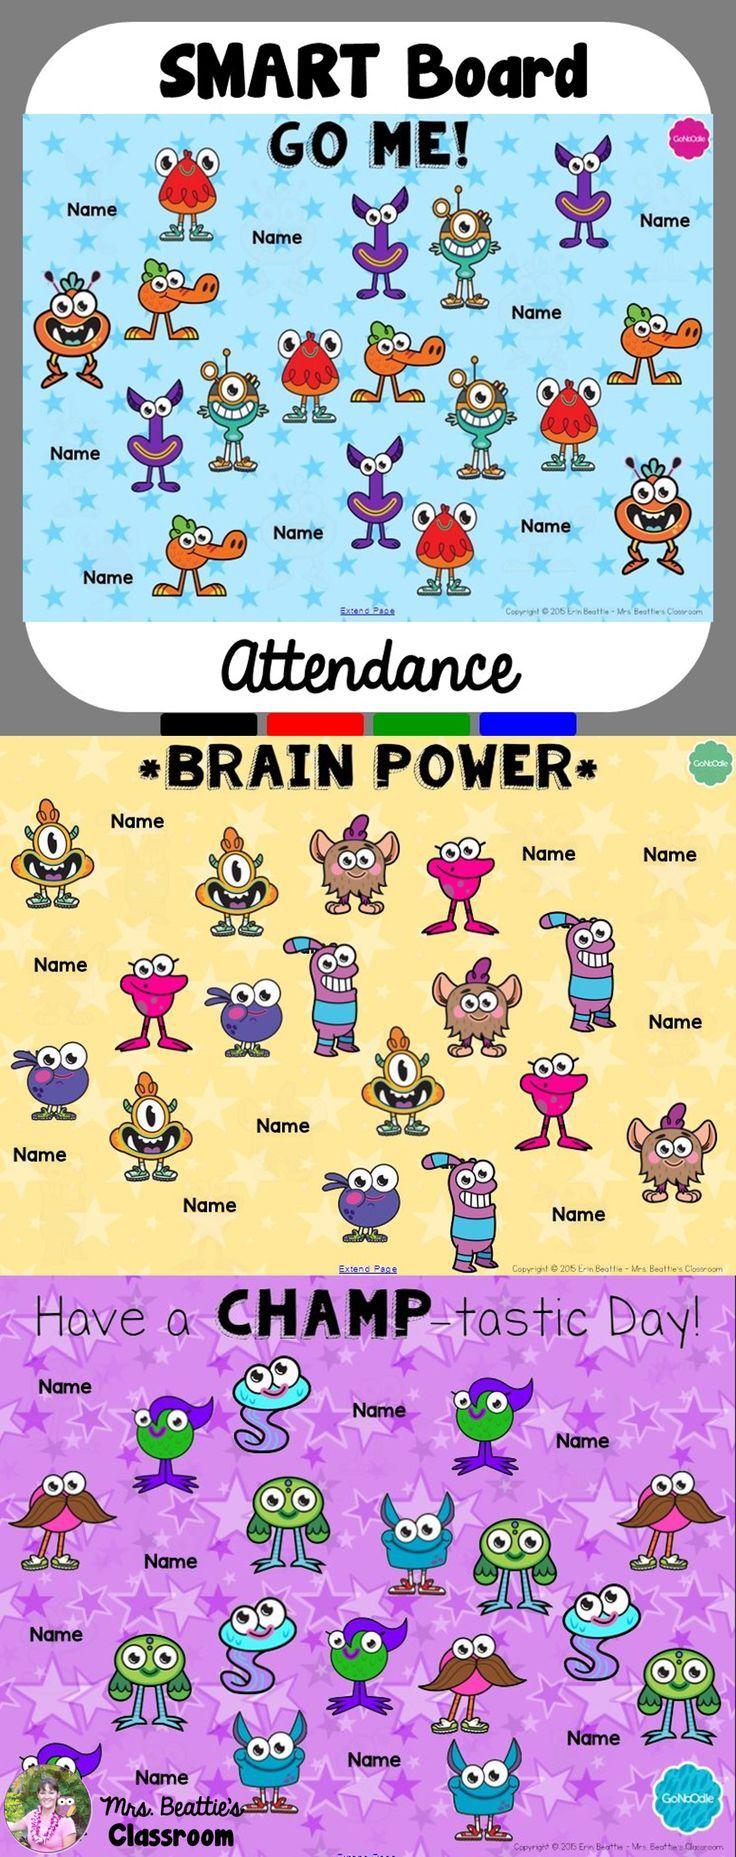 FREE GoNoodle Attendance for SMART Board from Mrs. Beattie's Classroom